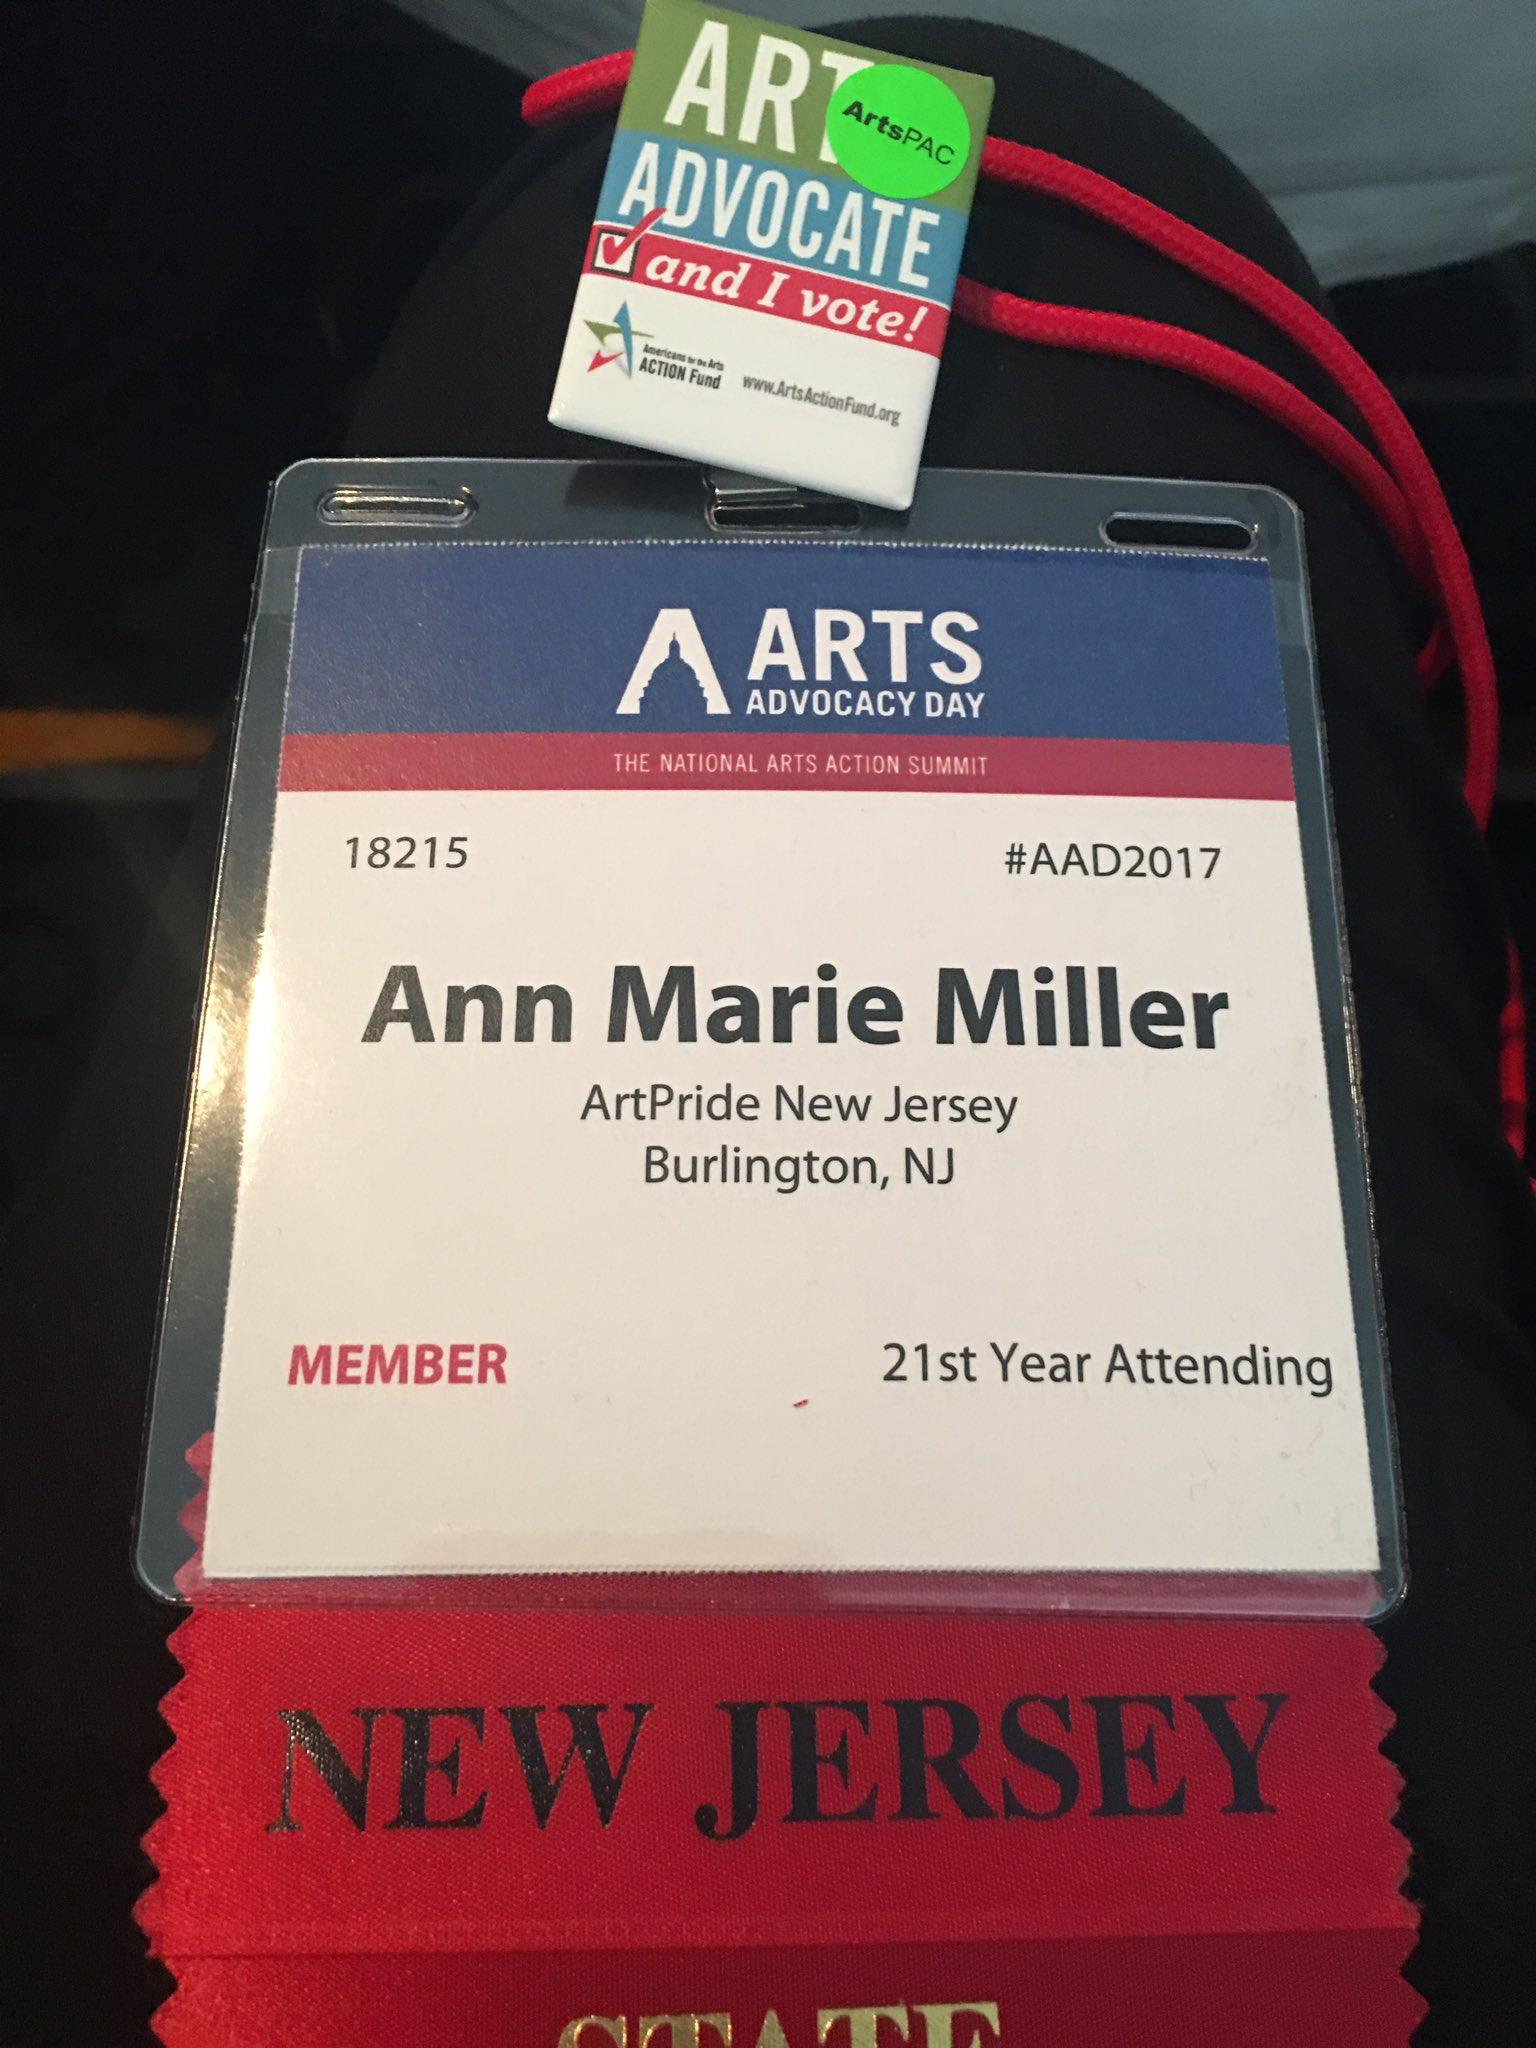 21 years & counting #artsadvocacy #saveNEA @Americans4Arts @ArtsActionFund https://t.co/JnqcWiqpmA